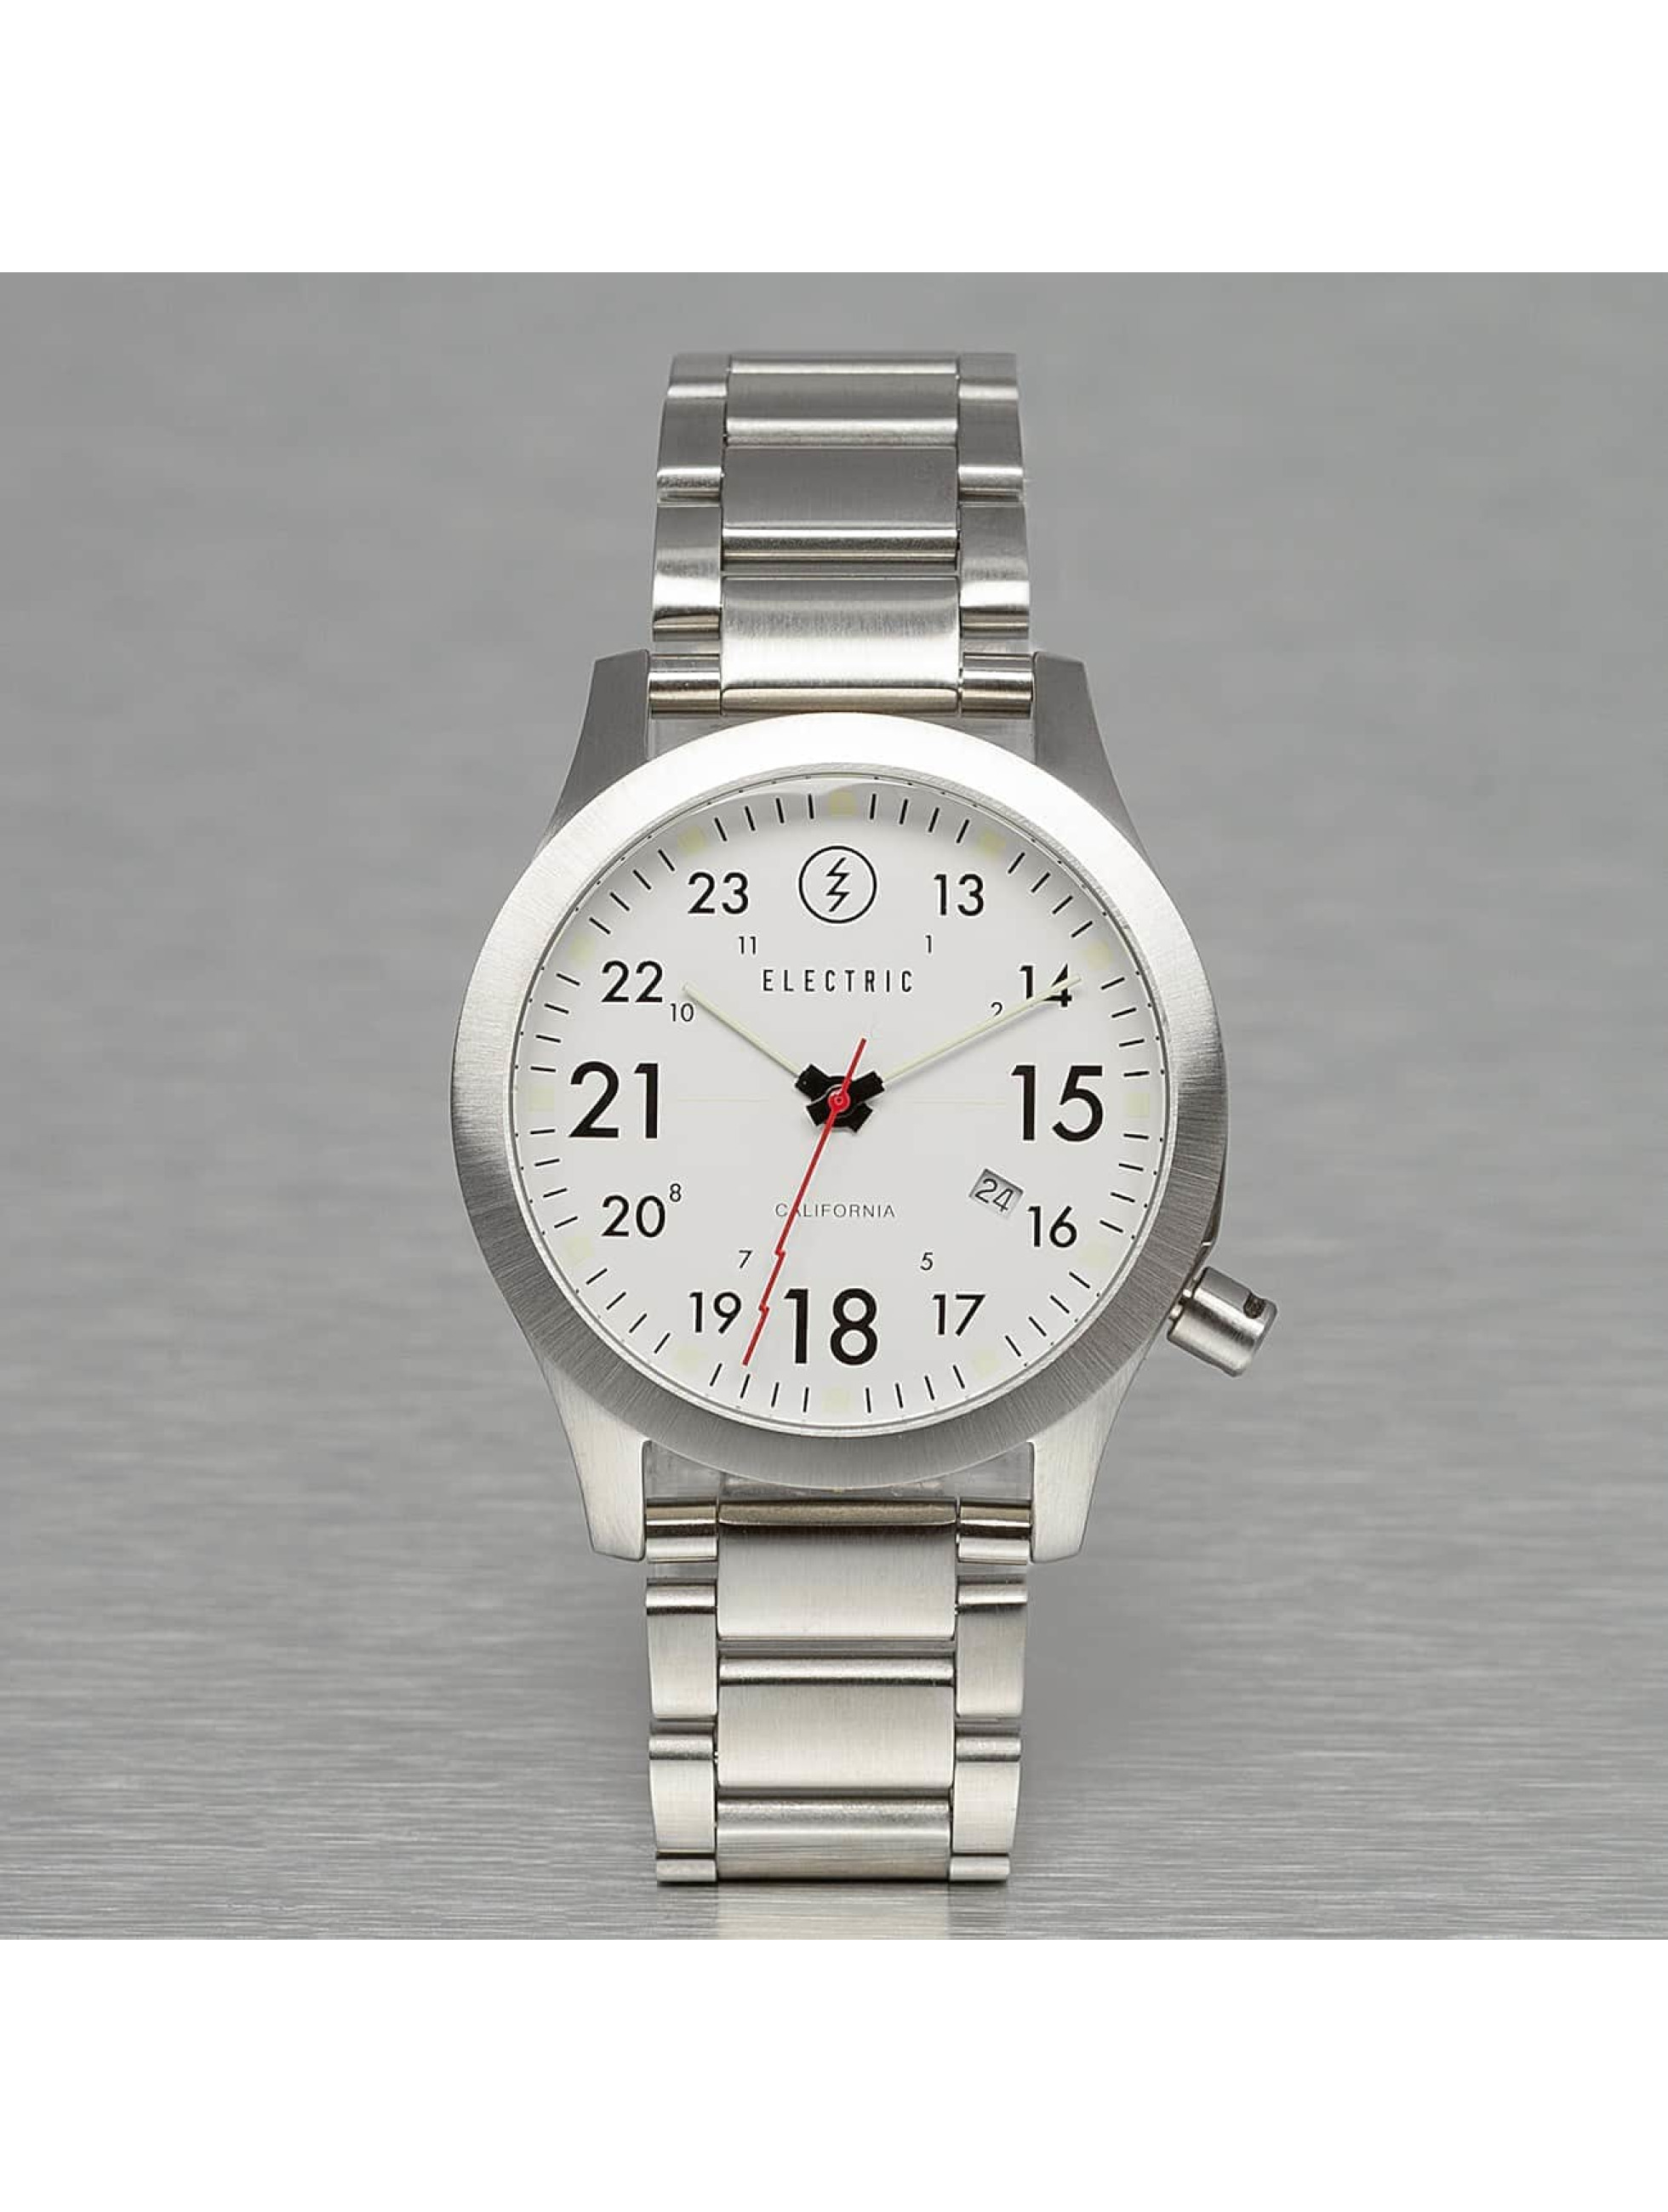 Electric Часы FW01 Stainless Steel серебро